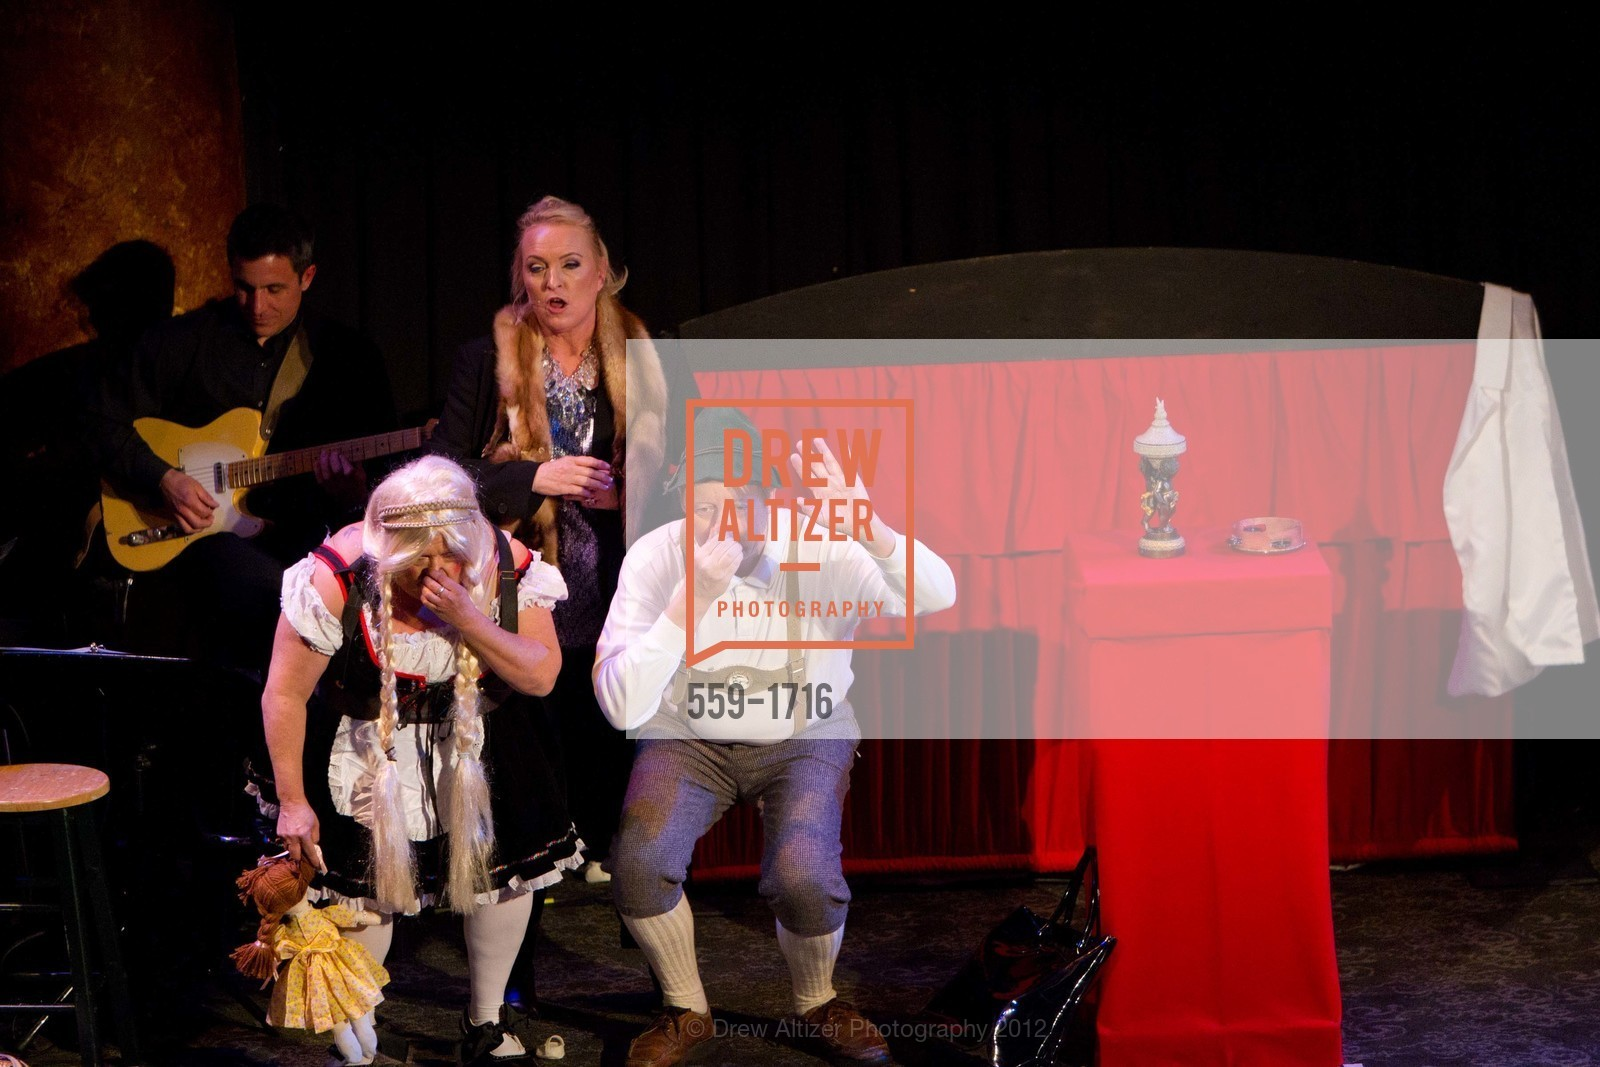 Performance, Photo #559-1716